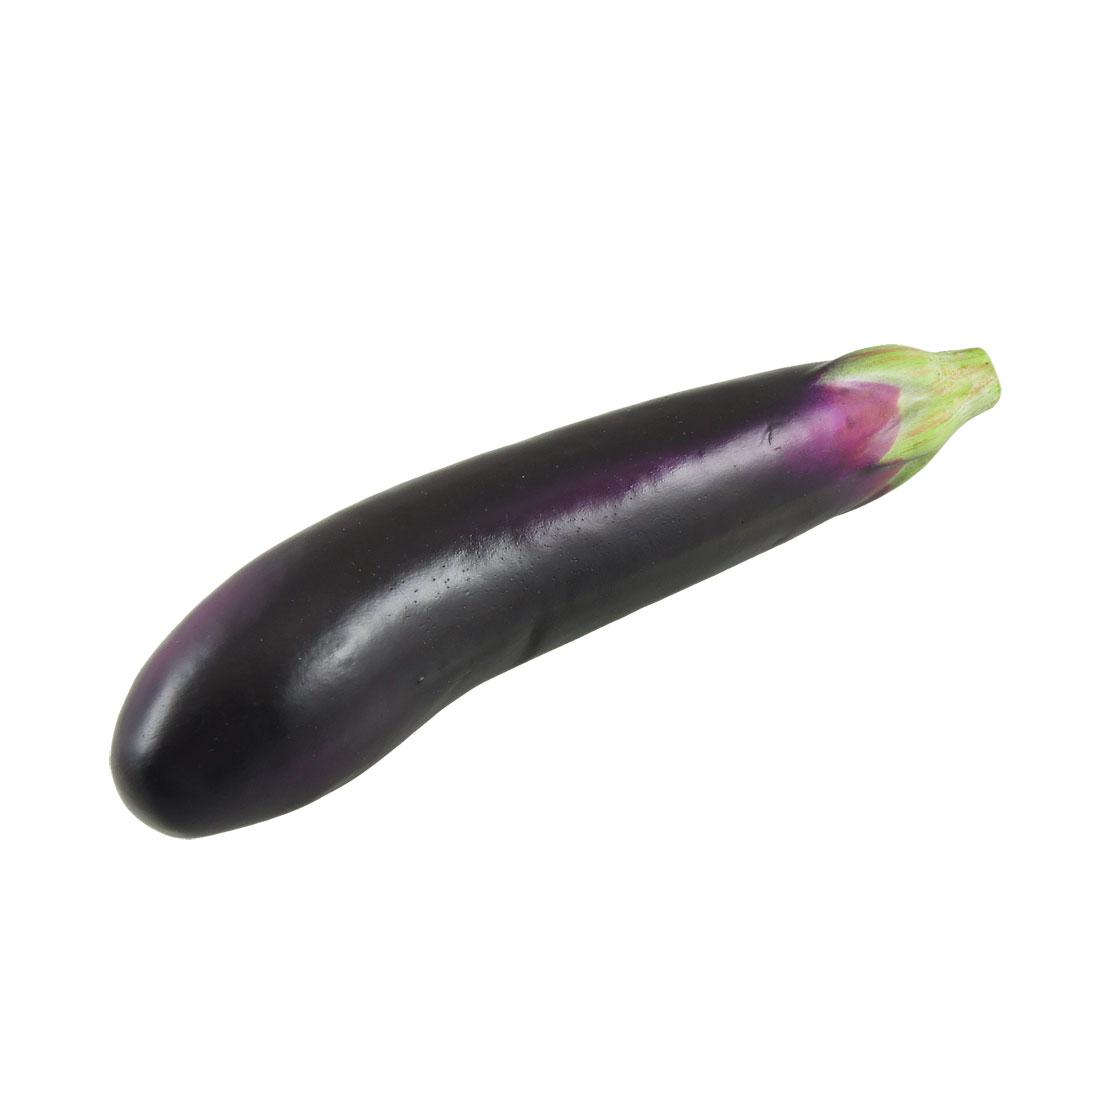 House Table Ornament Foam Eggplant Vegetable Display Centerpiece Dark Purple